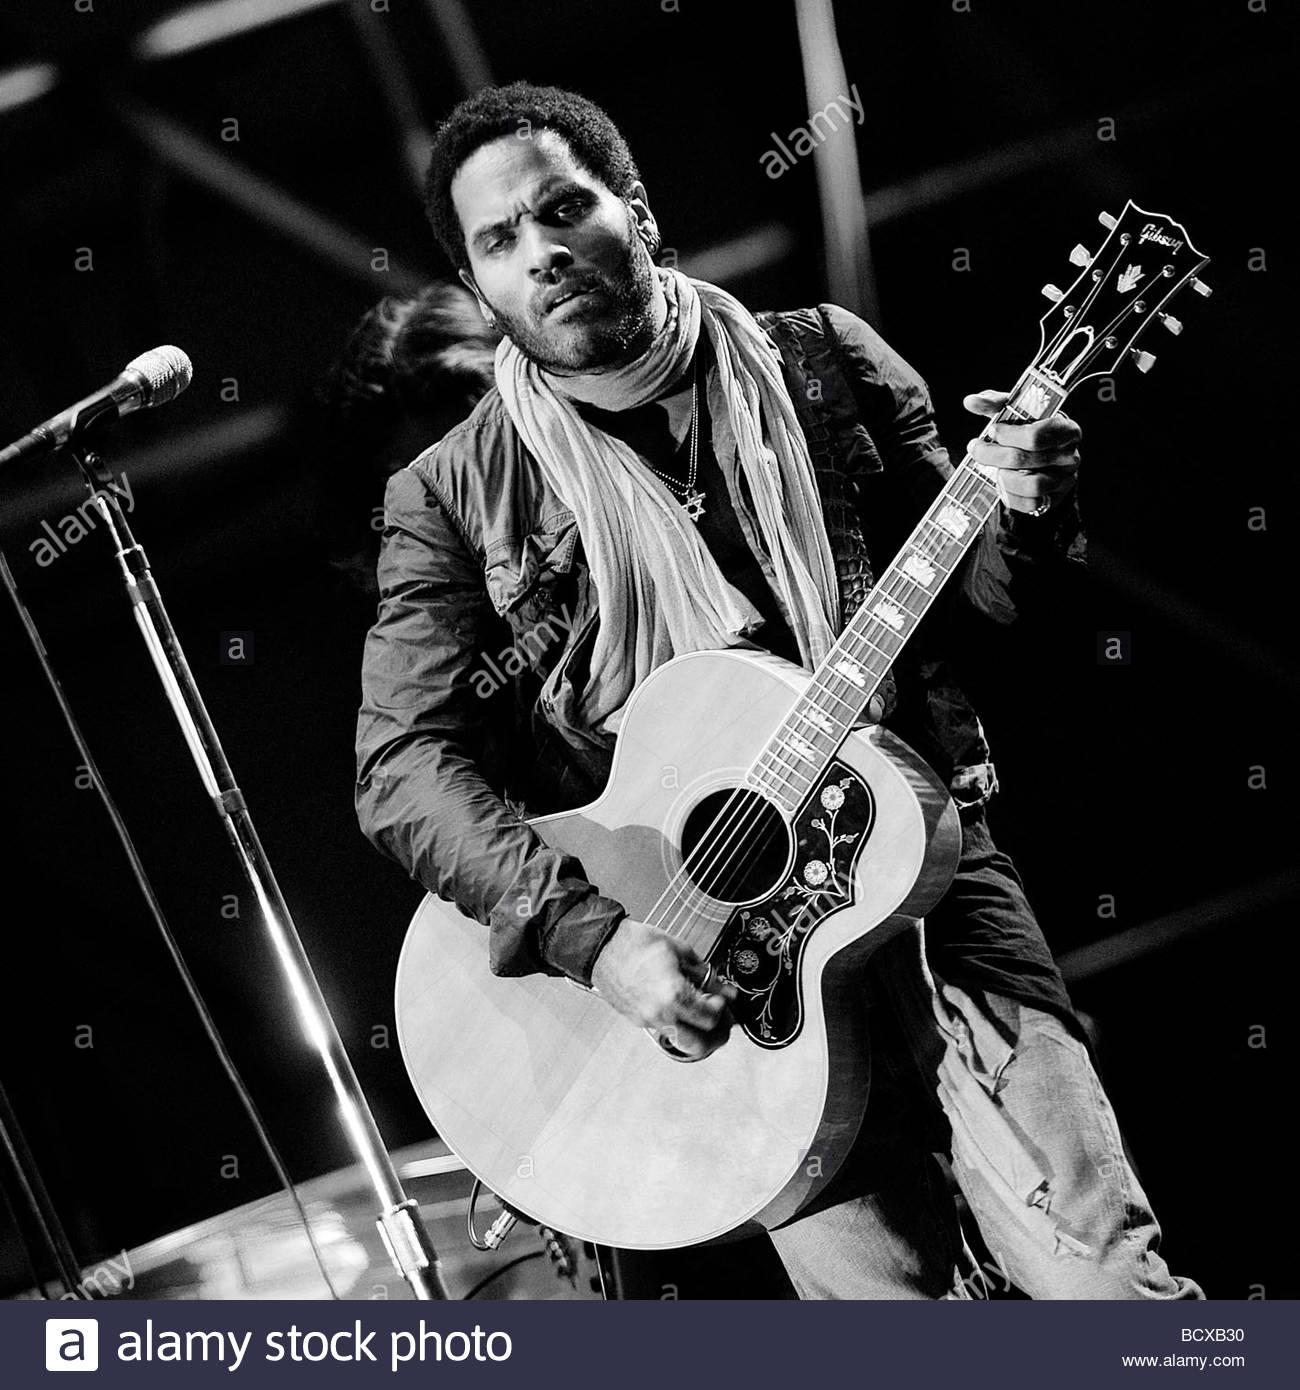 Lenny kravitz in concert torino 2009 stock image